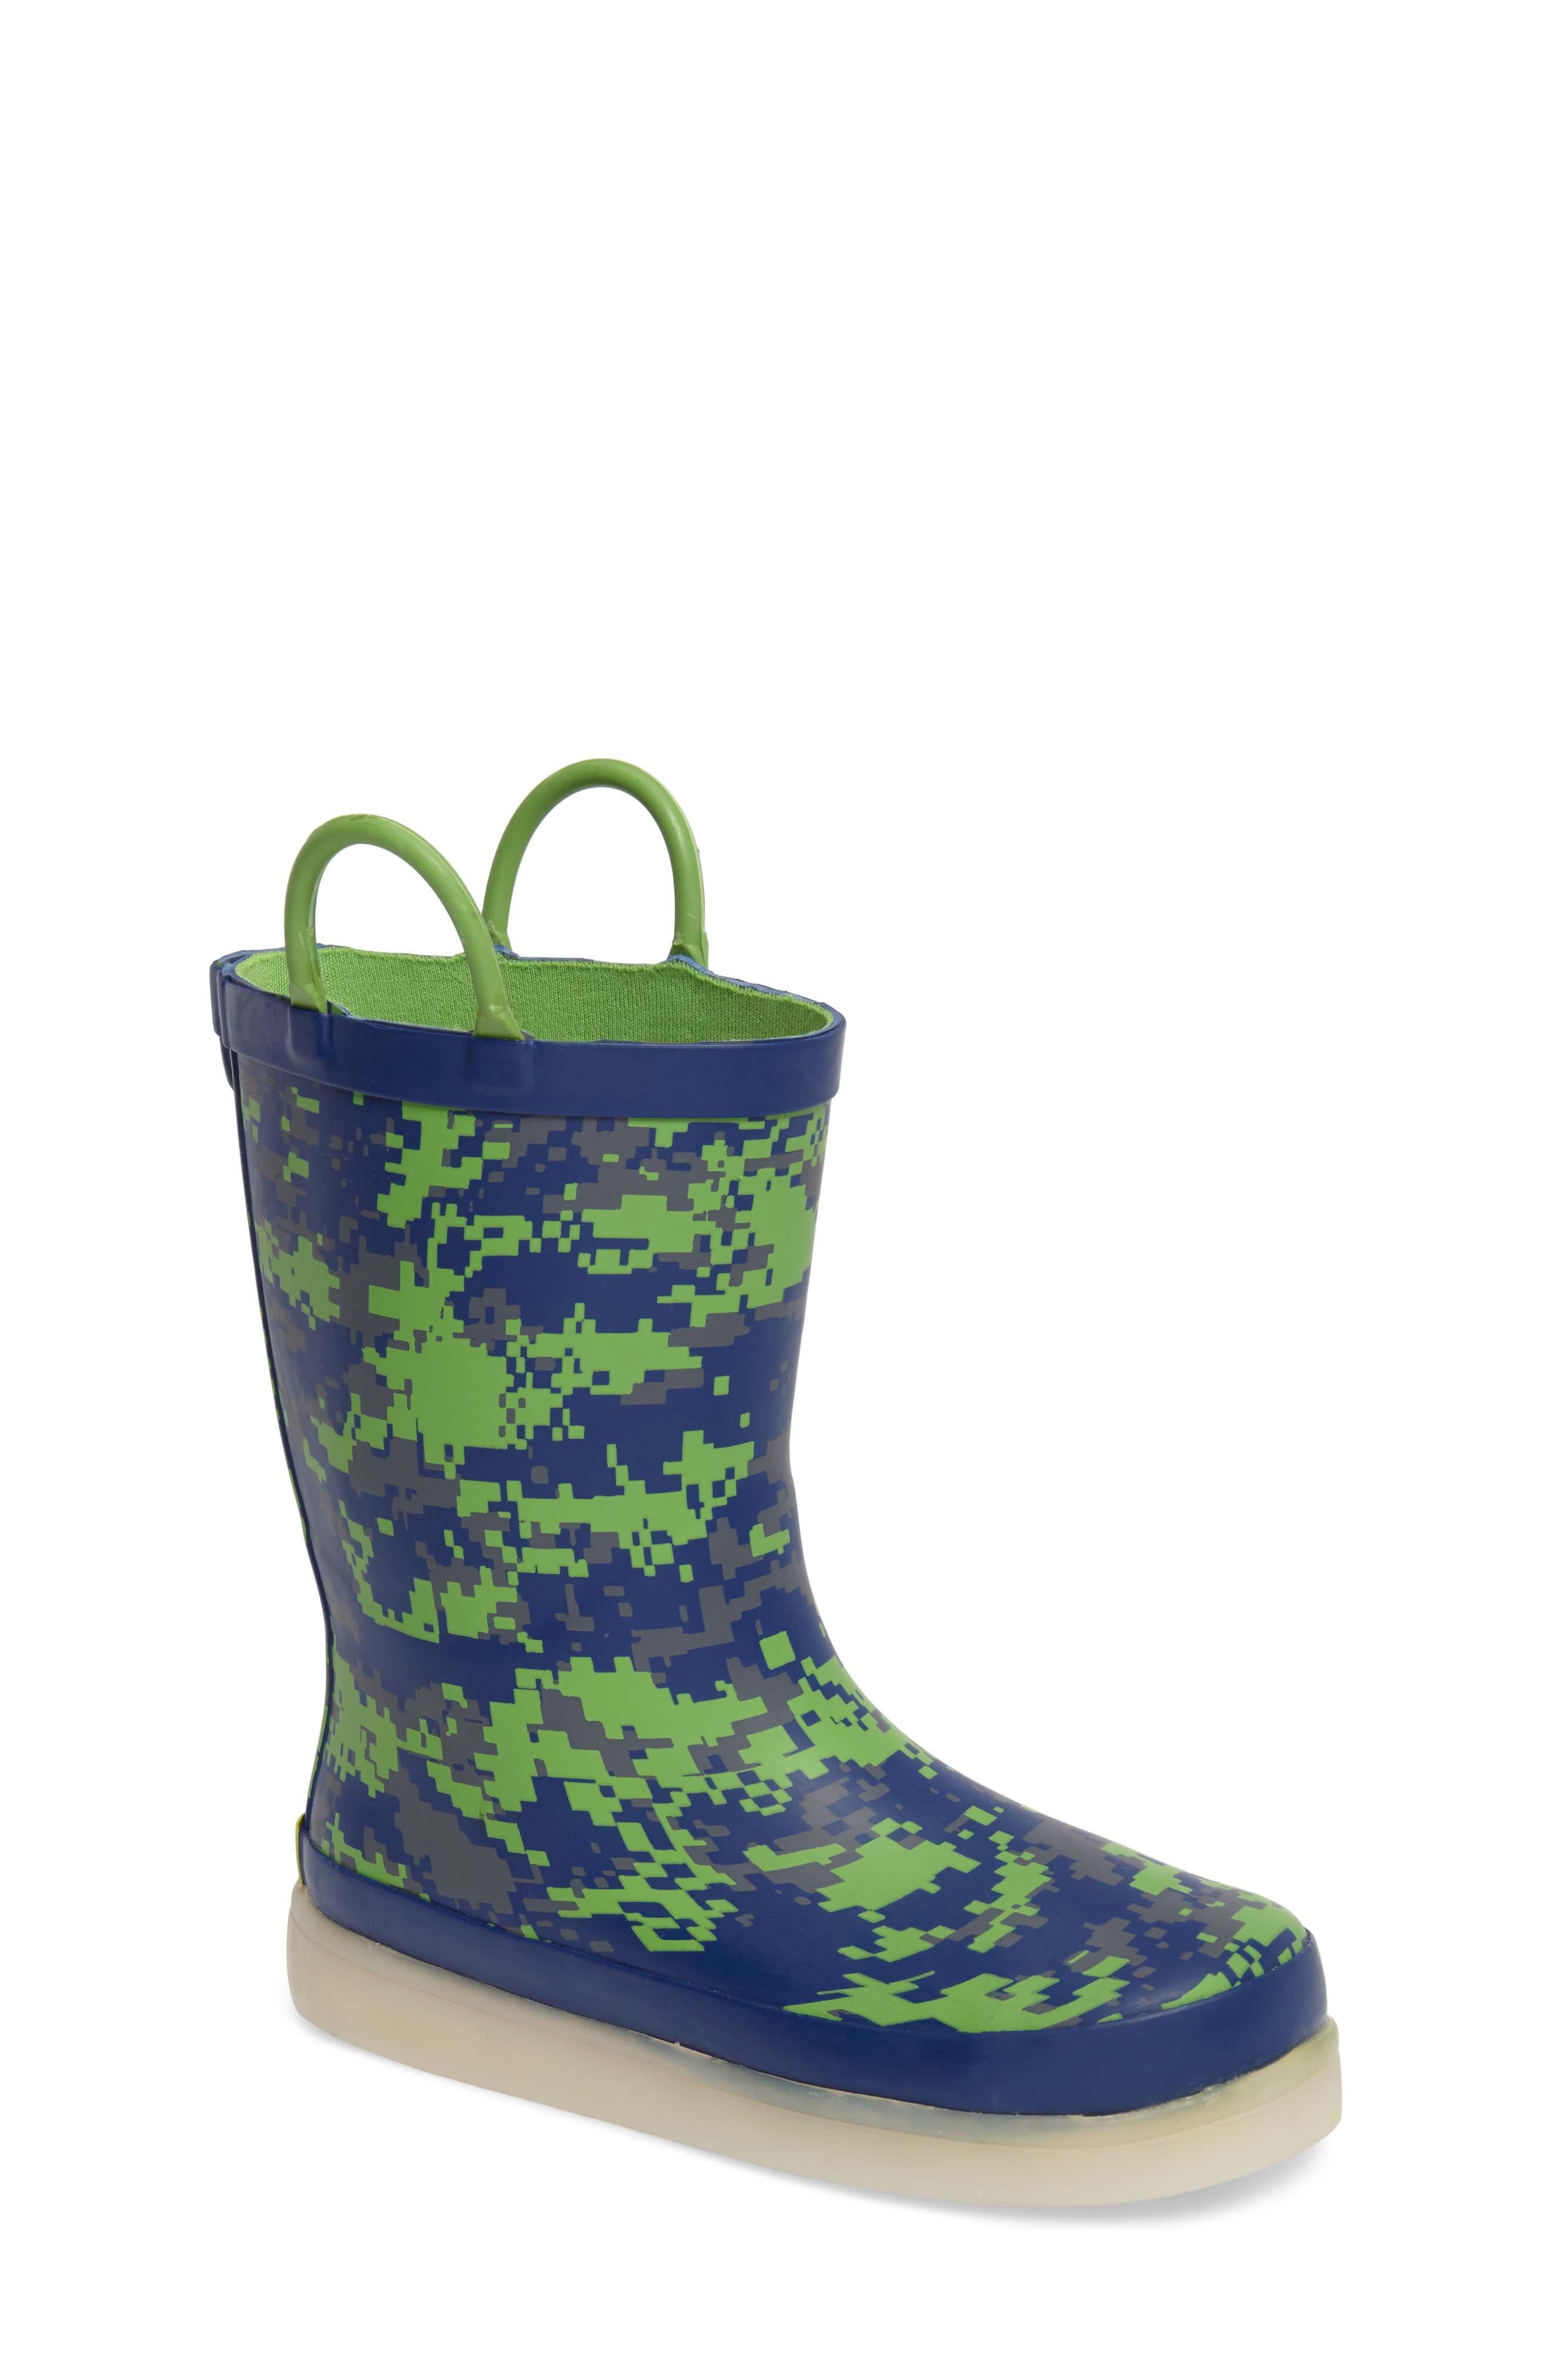 Alternate Image 1 Selected - Western Chief Digital Camo LED Rain Boot (Toddler, Little Kid & Big Kid)